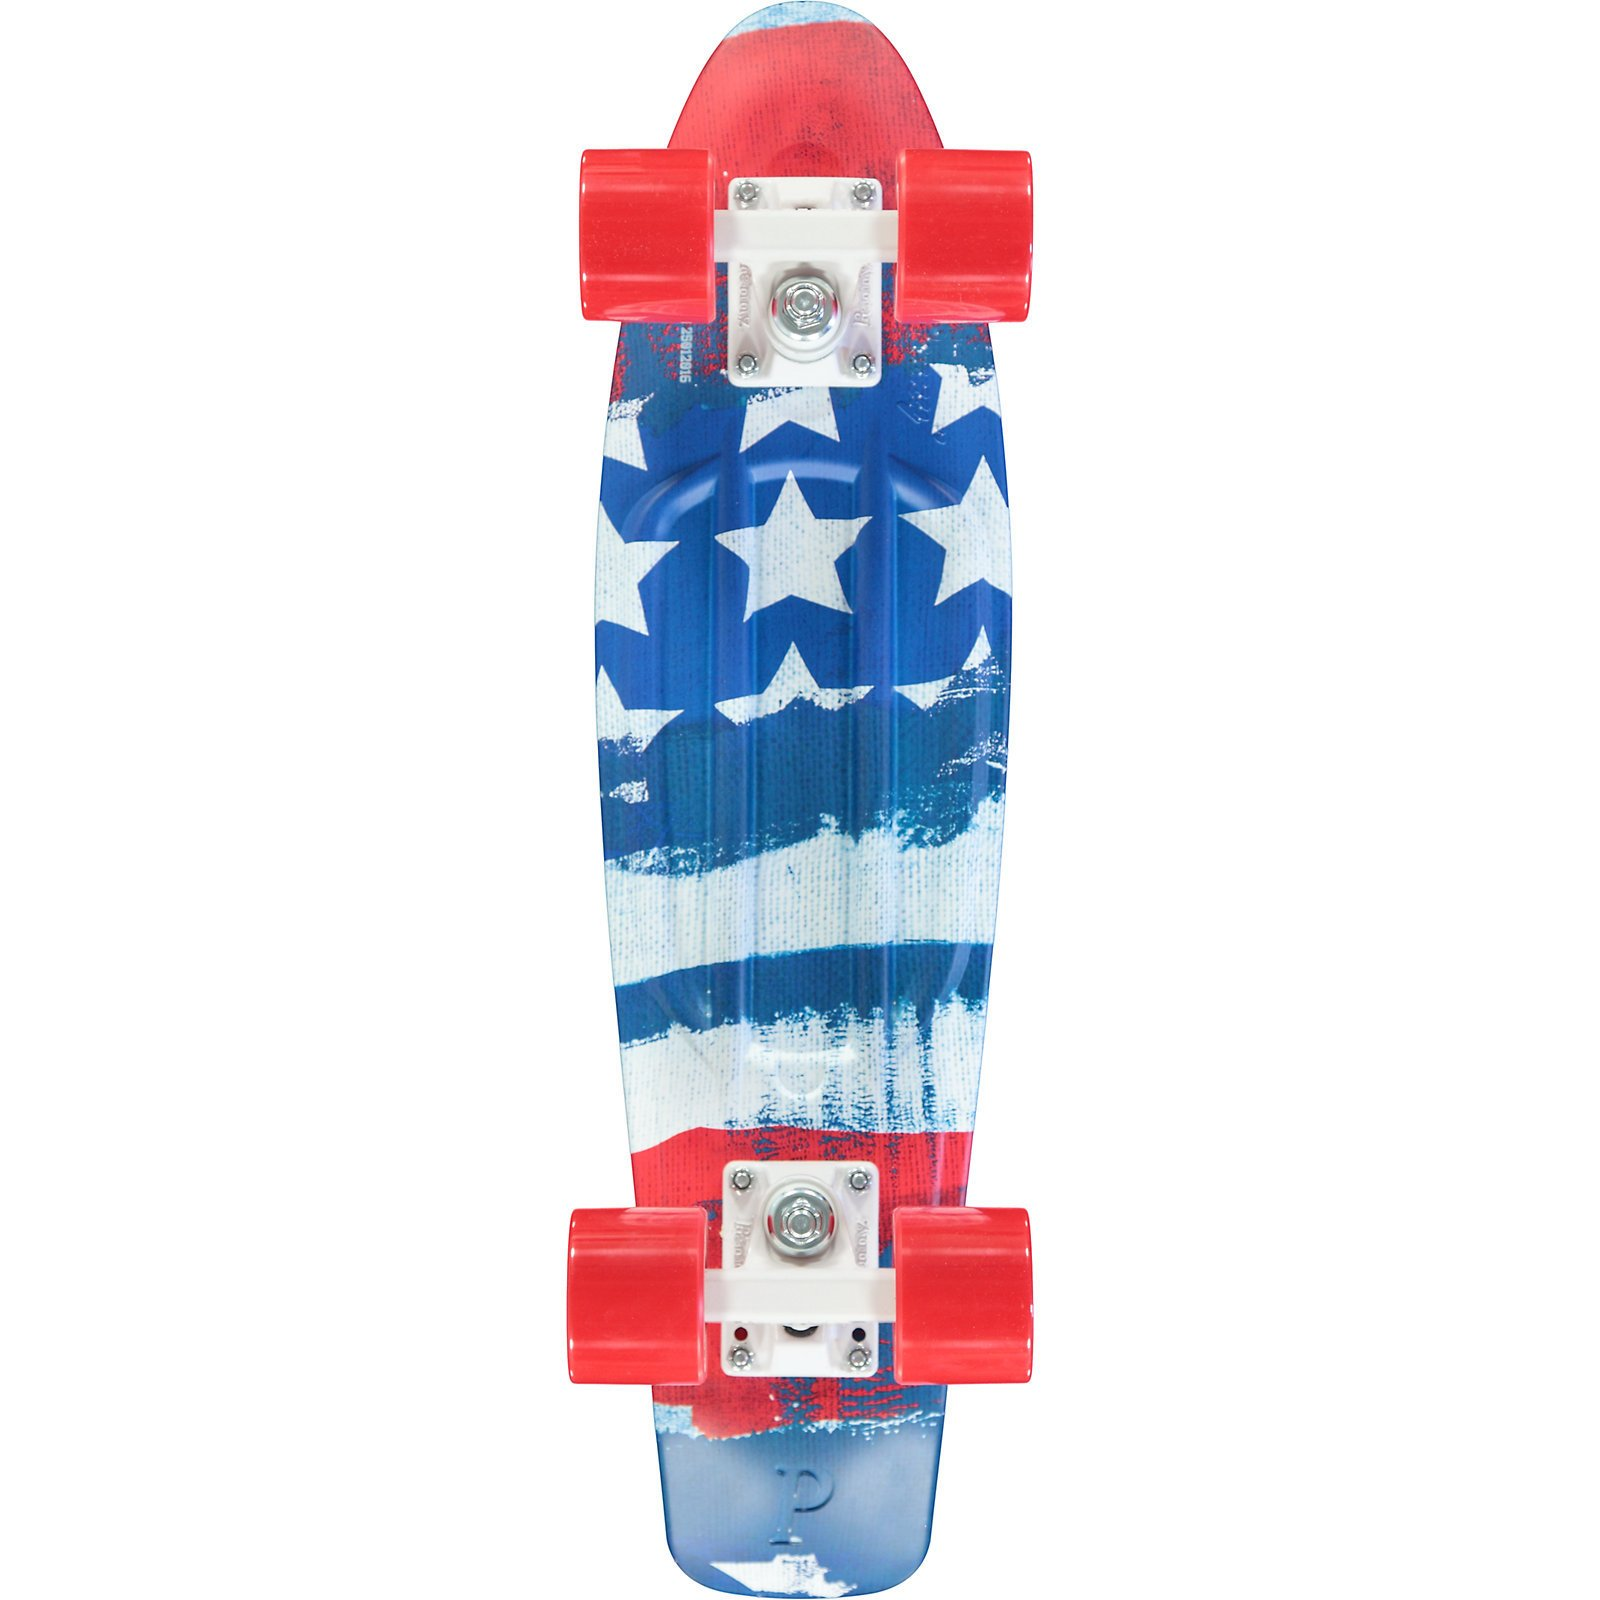 "Penny Skateboards Patriot 22"" Complete Skateboard - 6"" x 22"""